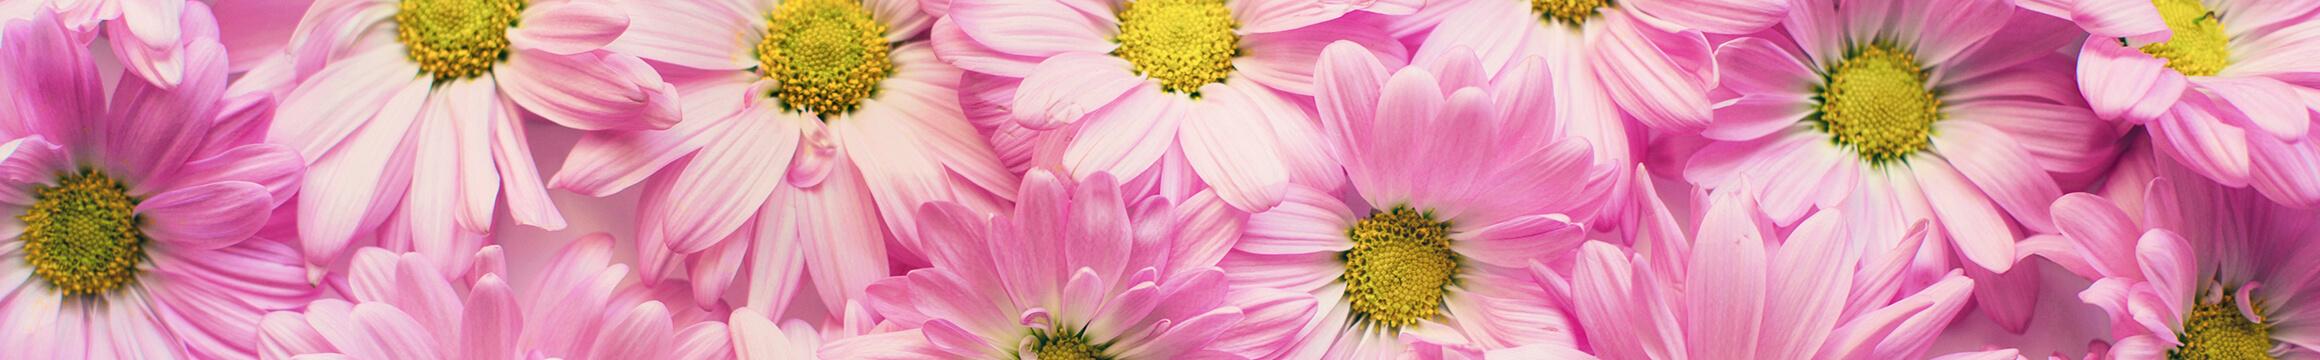 Floral 18